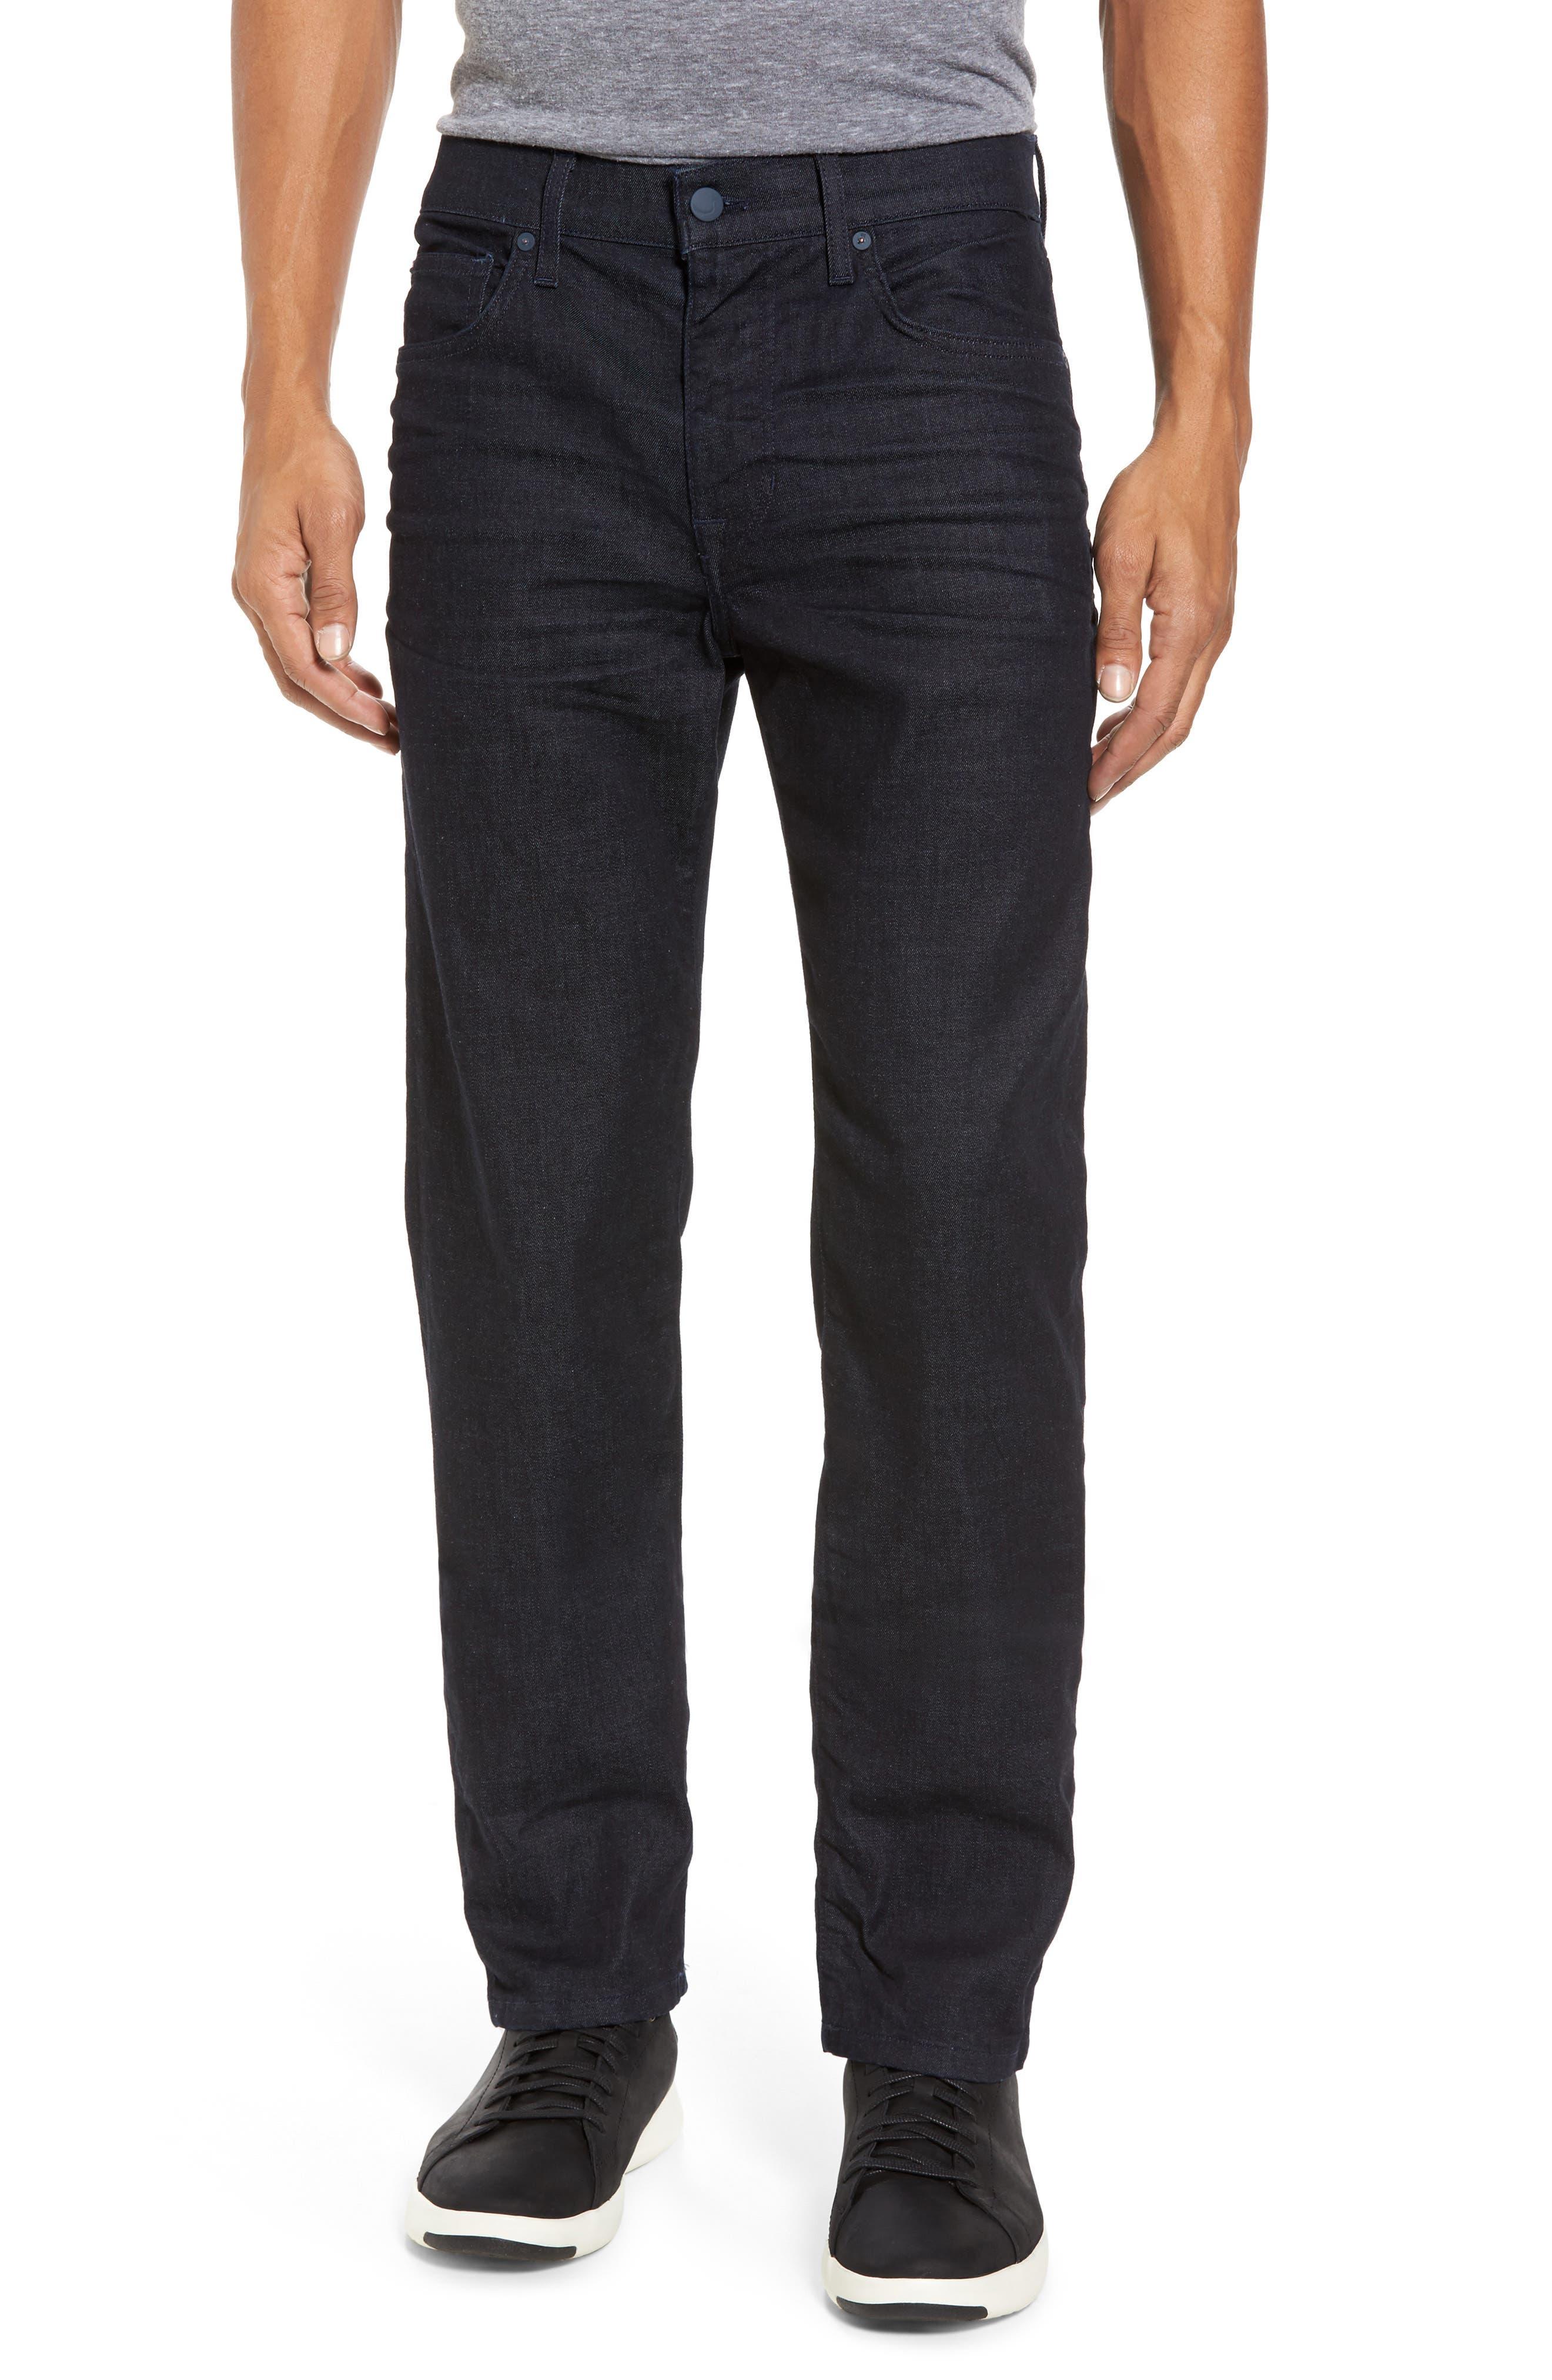 Brixton Slim Straight Fit Jeans,                             Main thumbnail 1, color,